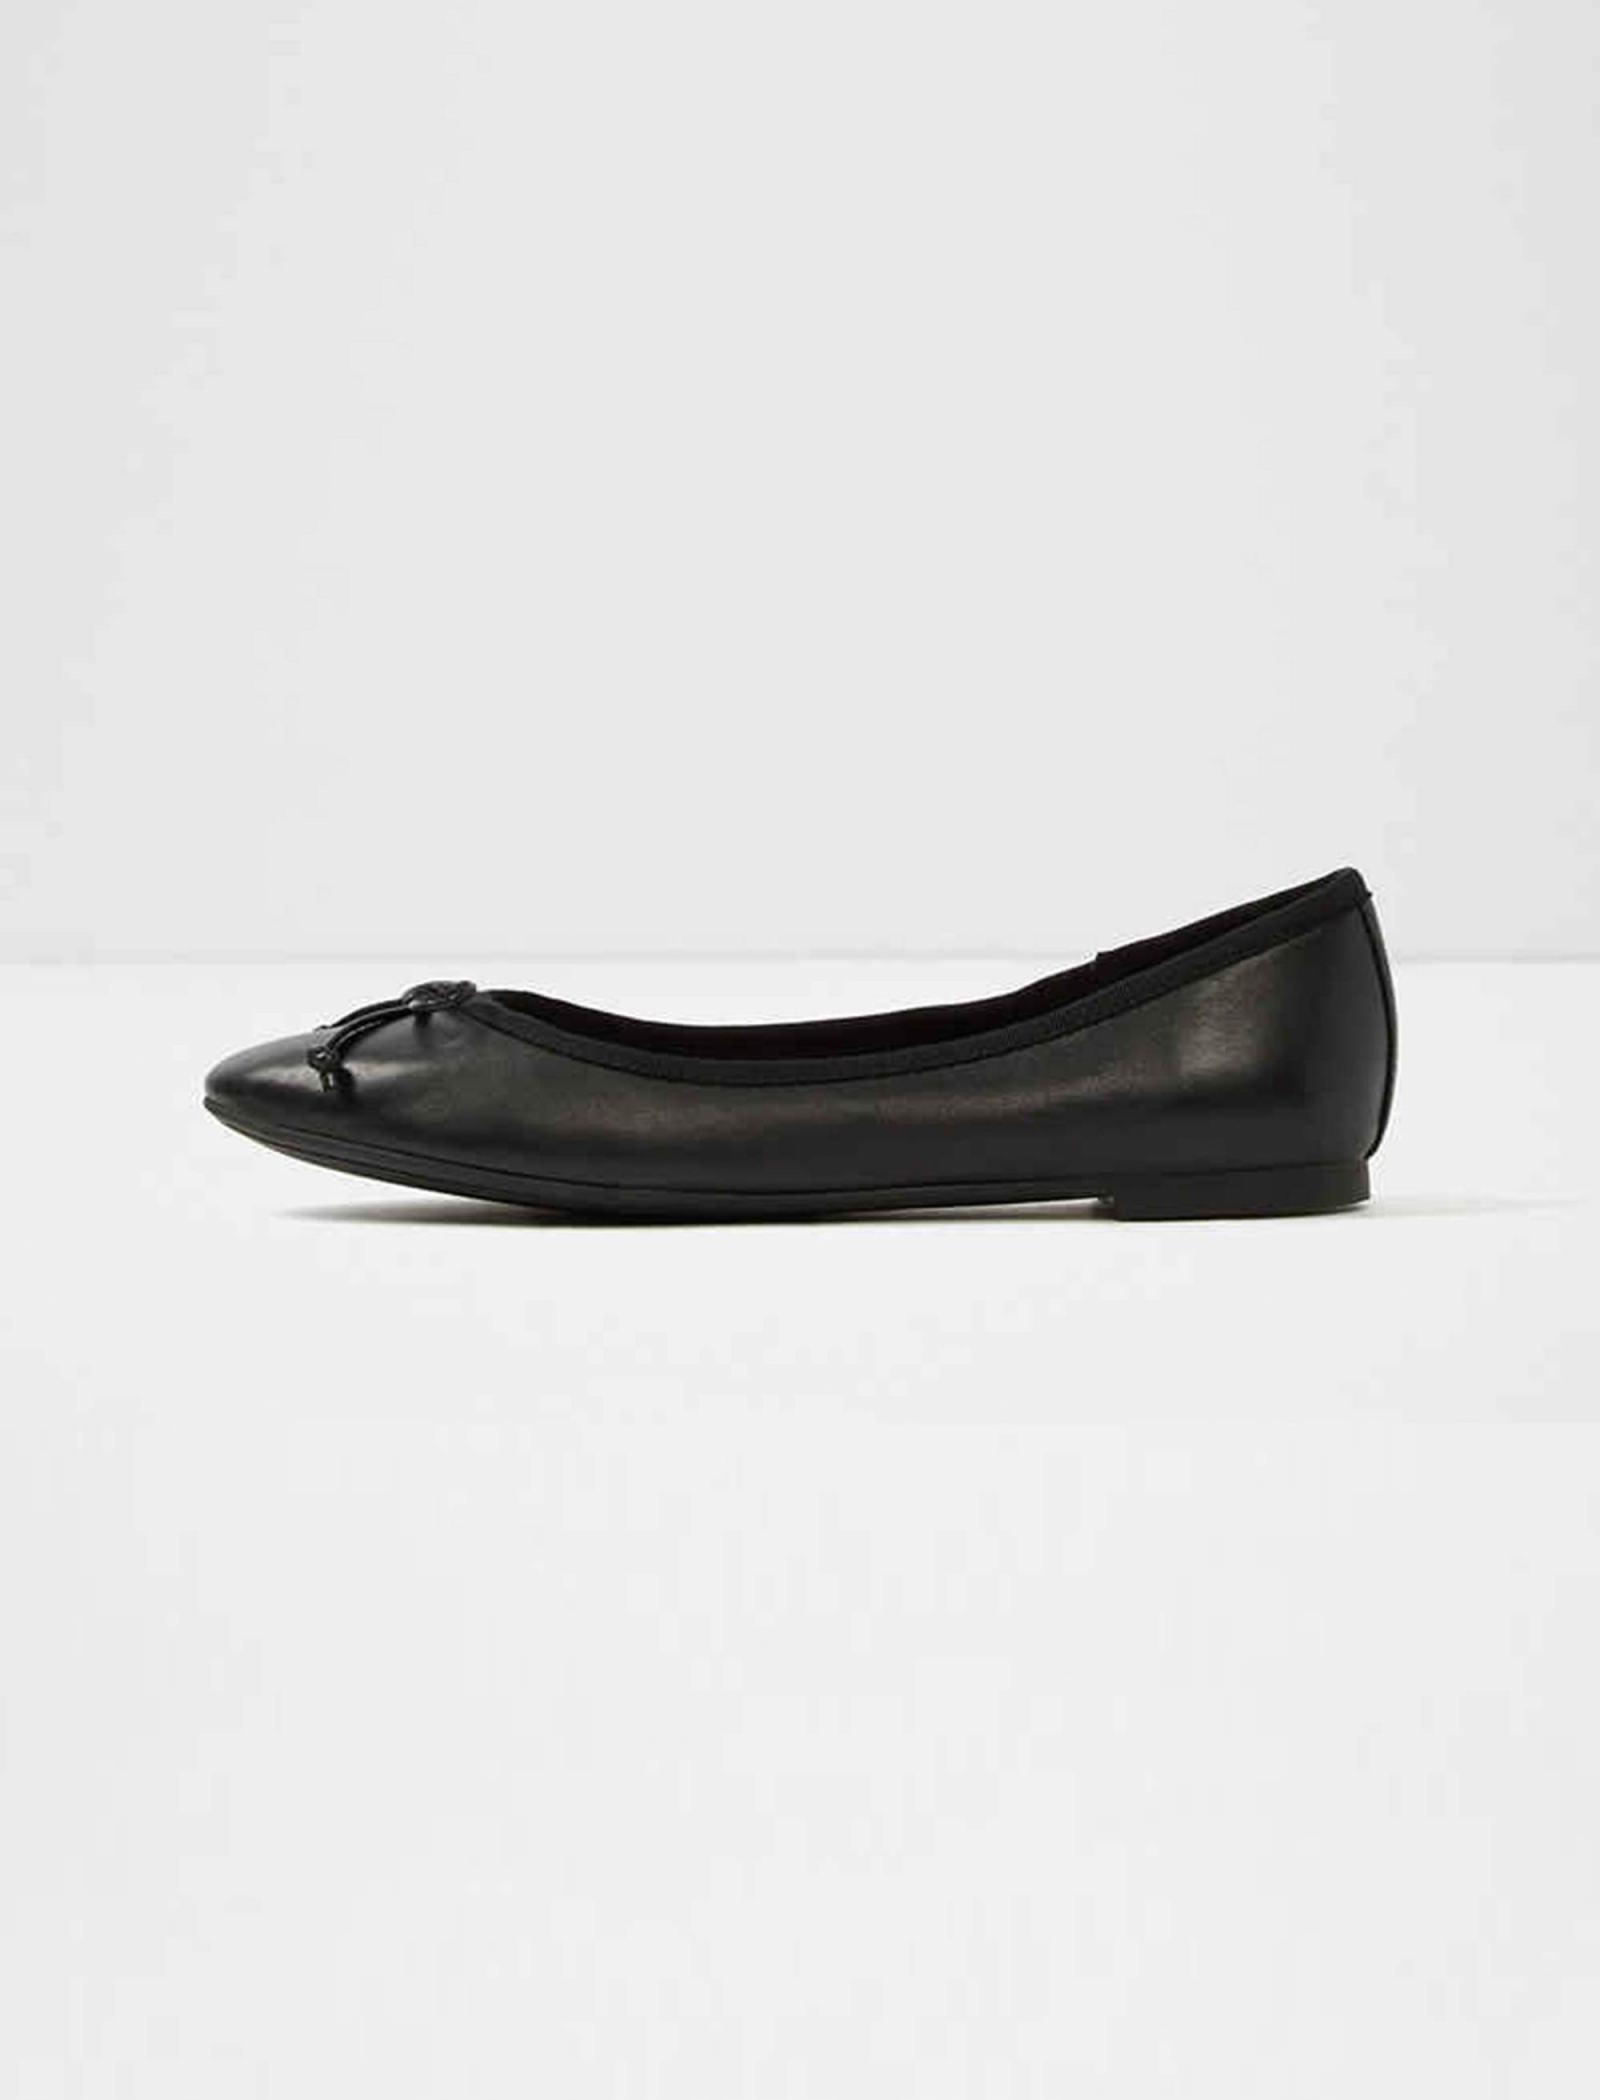 کفش تخت عروسکی چرم زنانه - آلدو - مشکي - 2